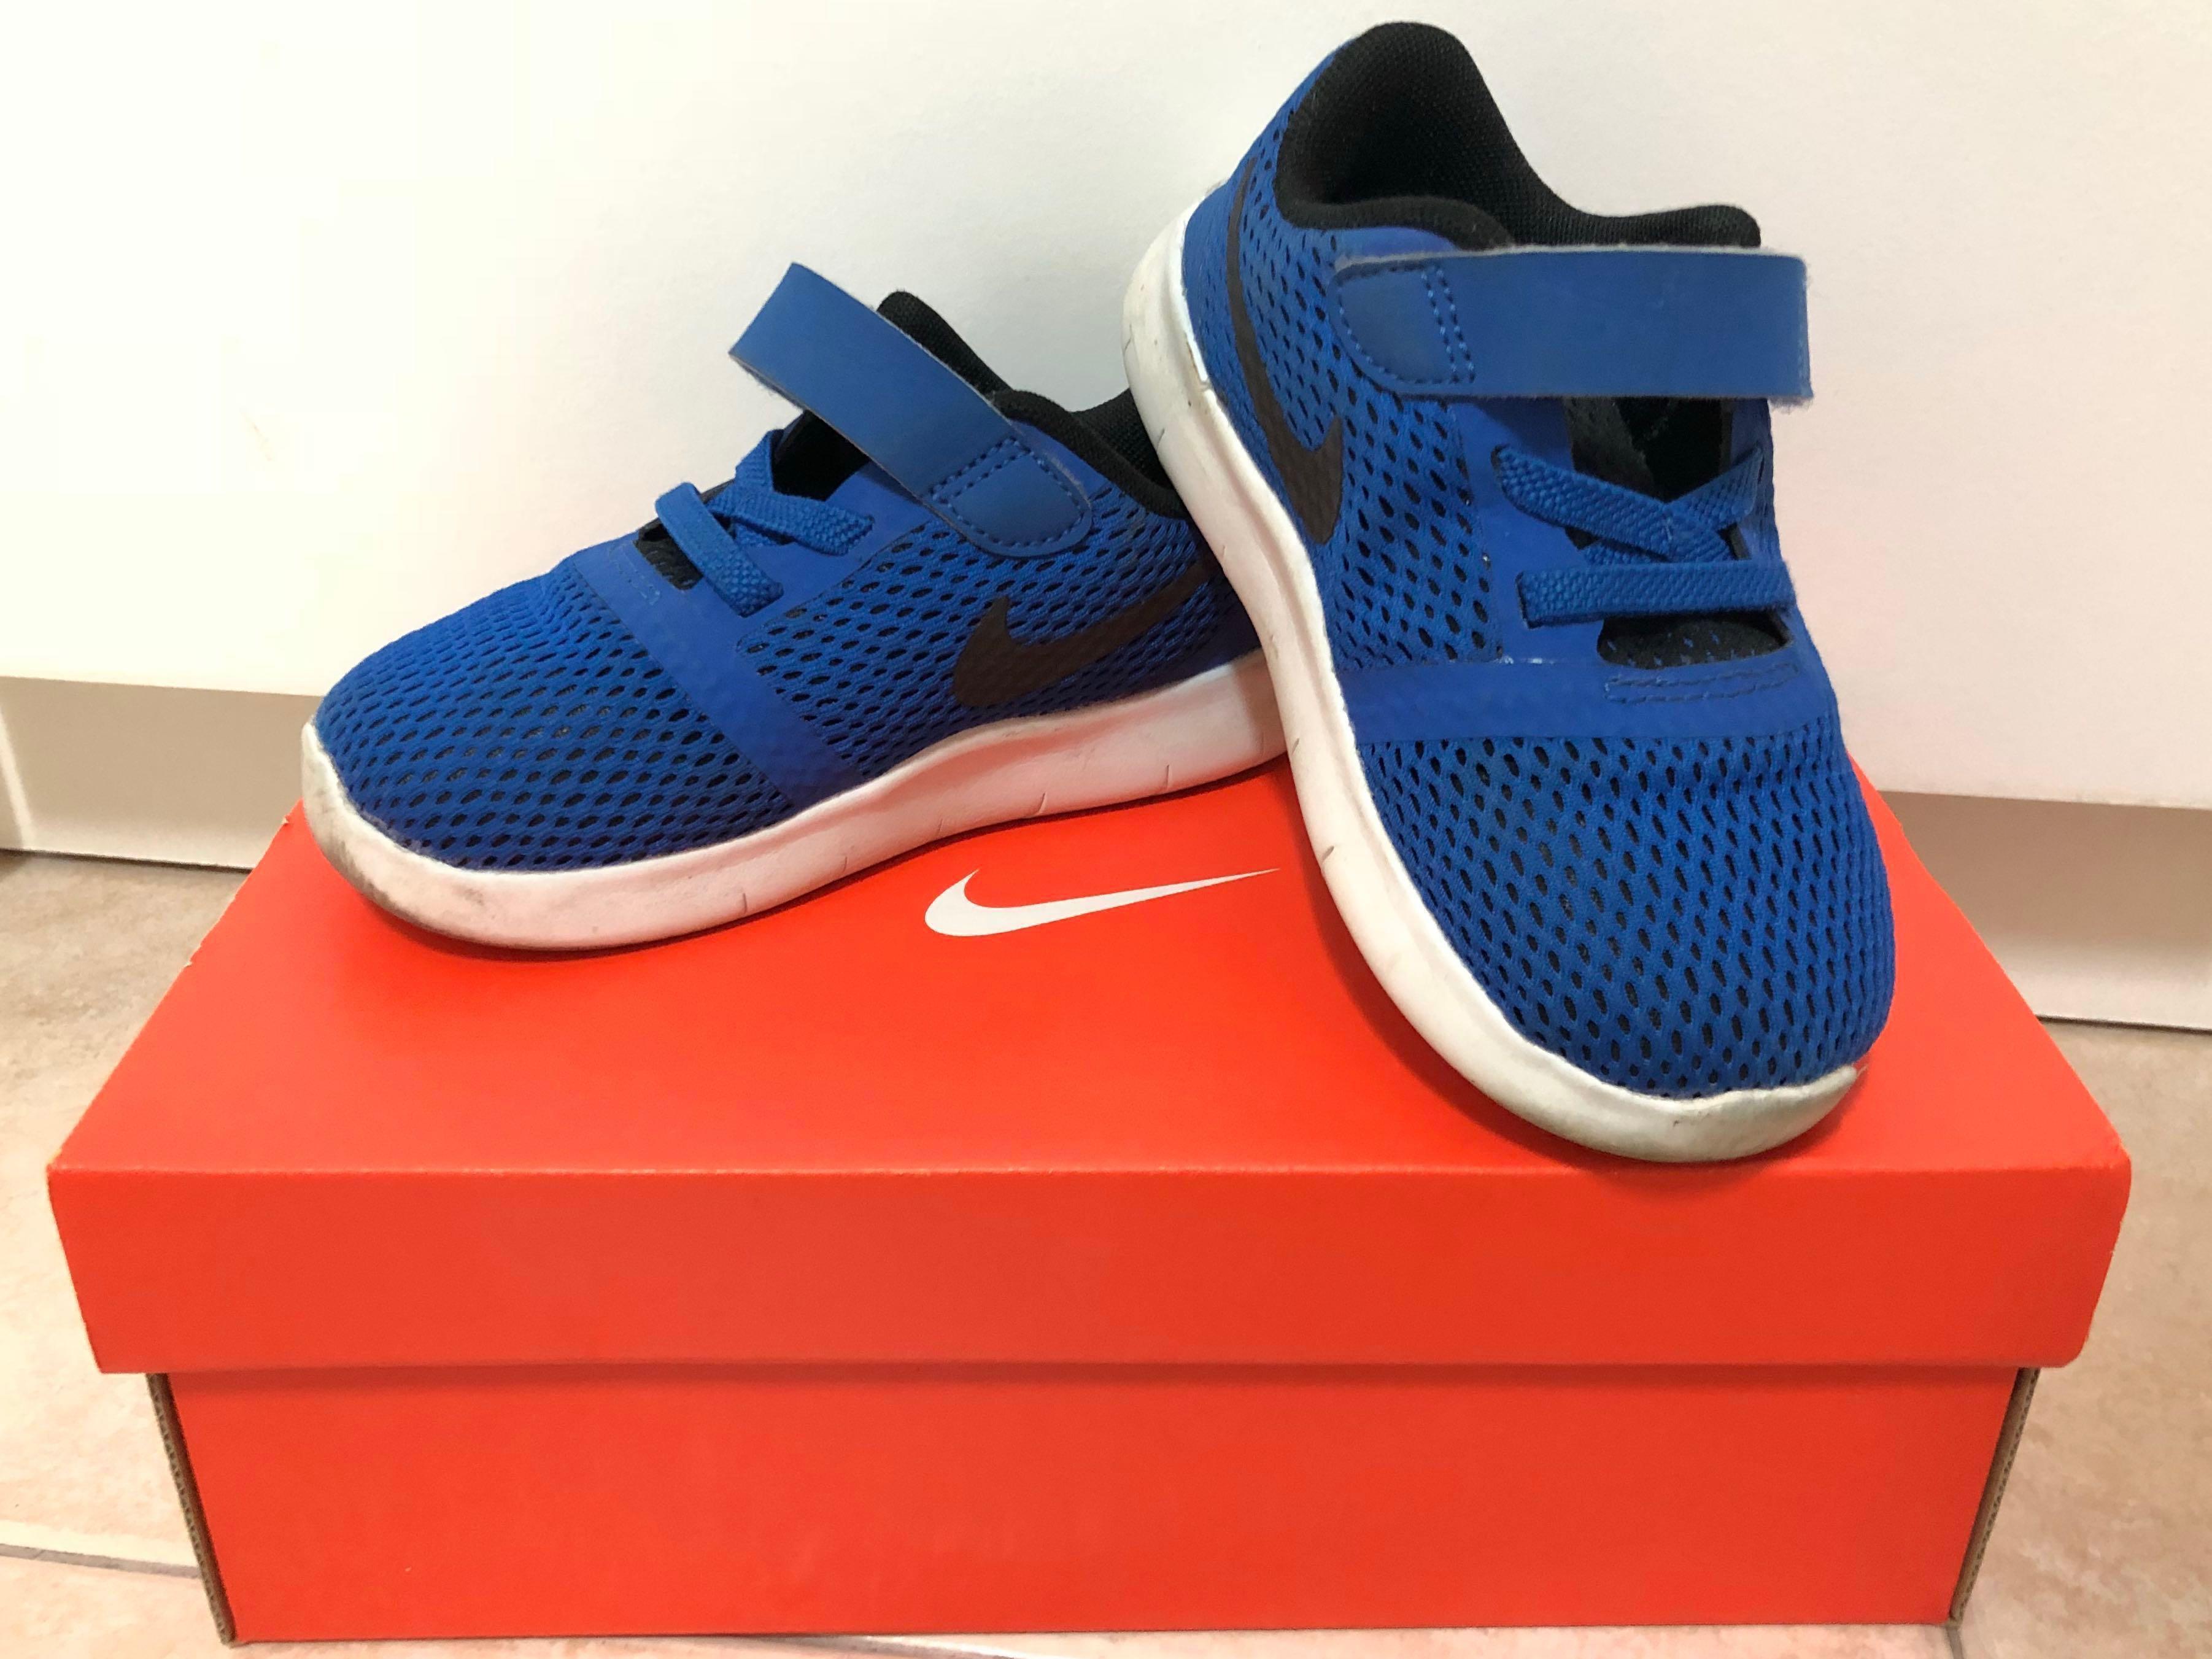 Preloved Nike Toddler Shoes size 8C